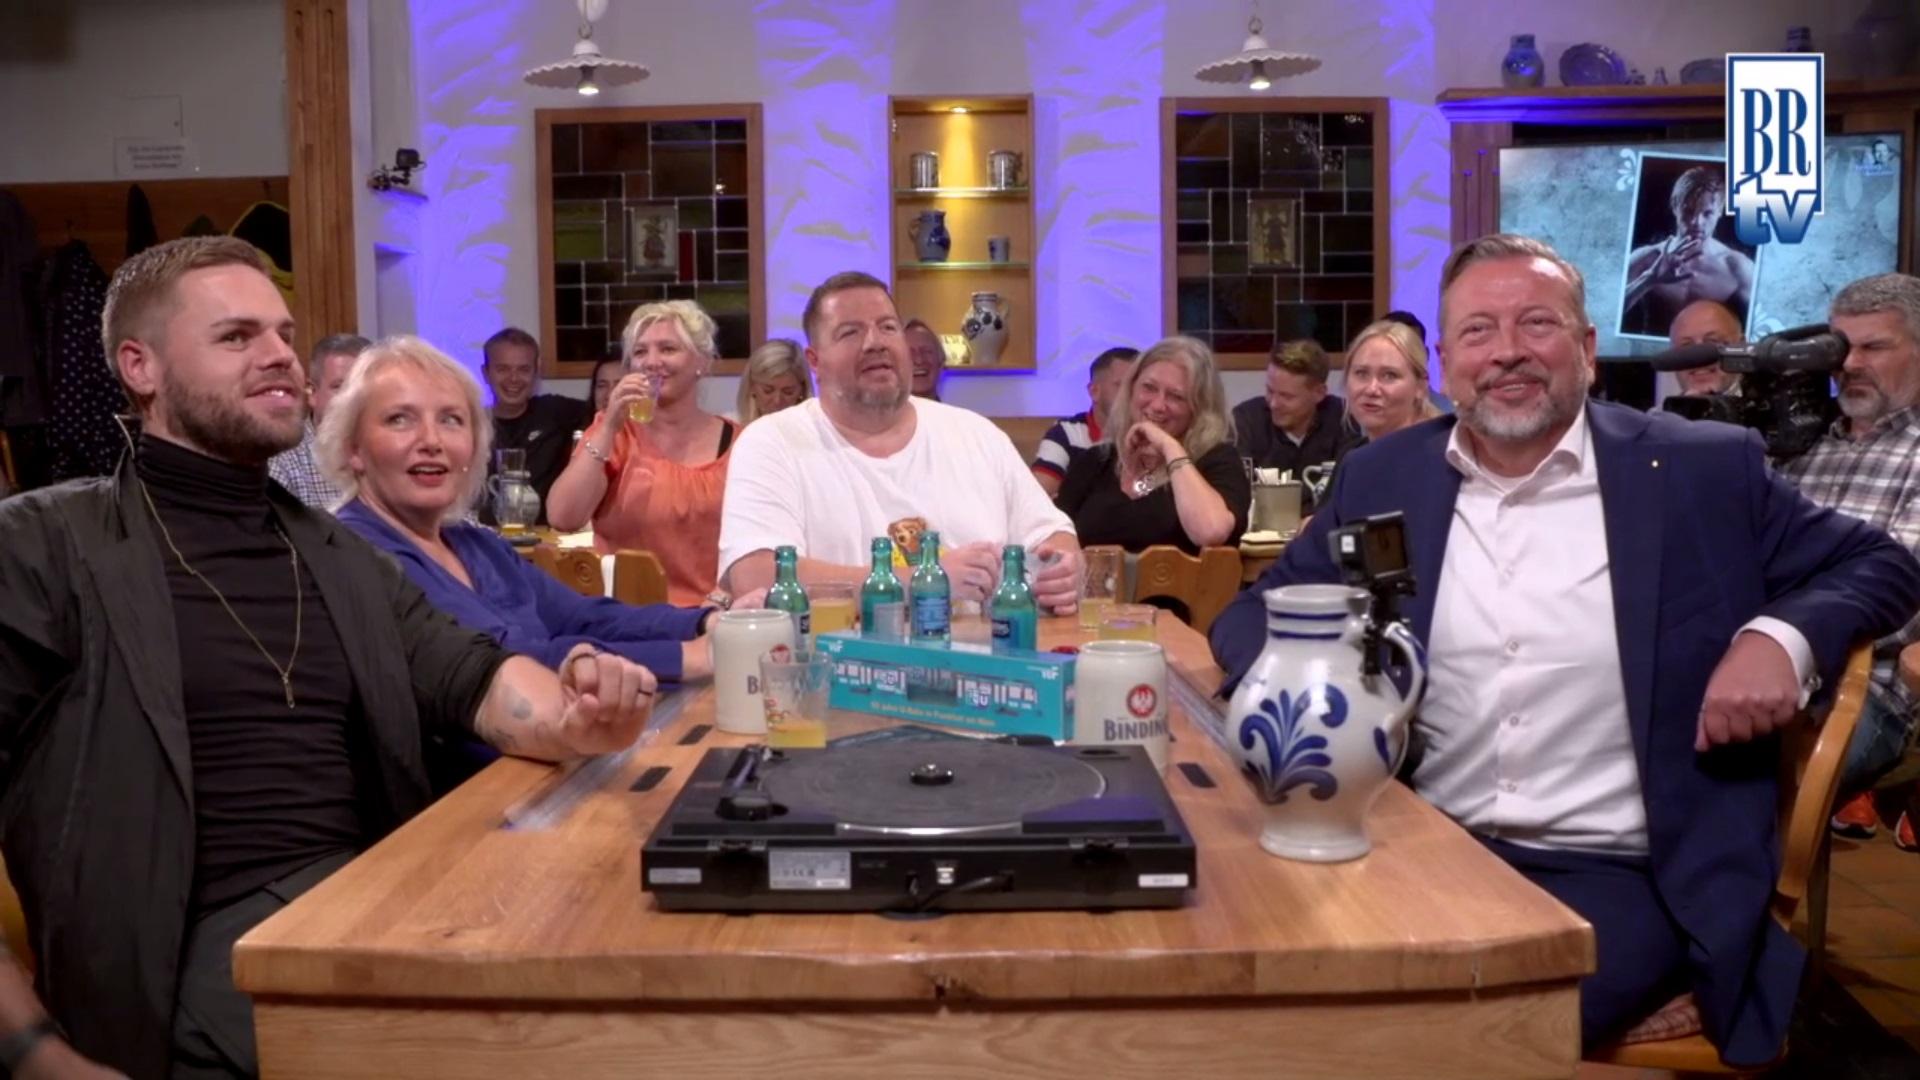 Bembel & Gebabbel – Folge 48 mit Prof. Knut Ringat, Constanze Angermann & Daniel Schuhmacherb